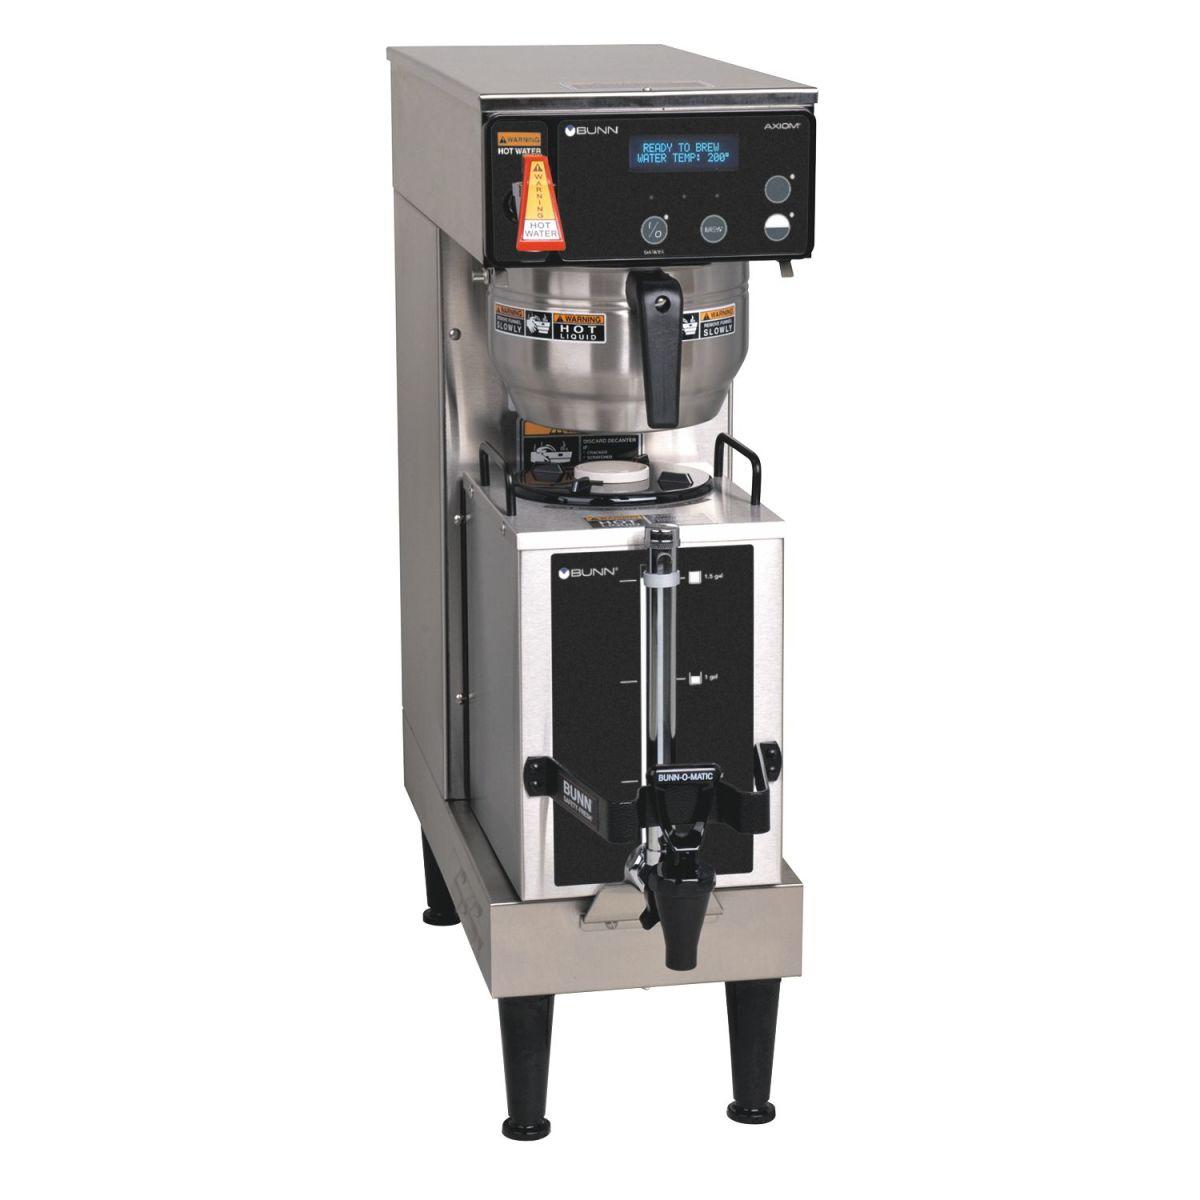 Single® AXIOM® GPR 35, with 1.5 Gallon Server